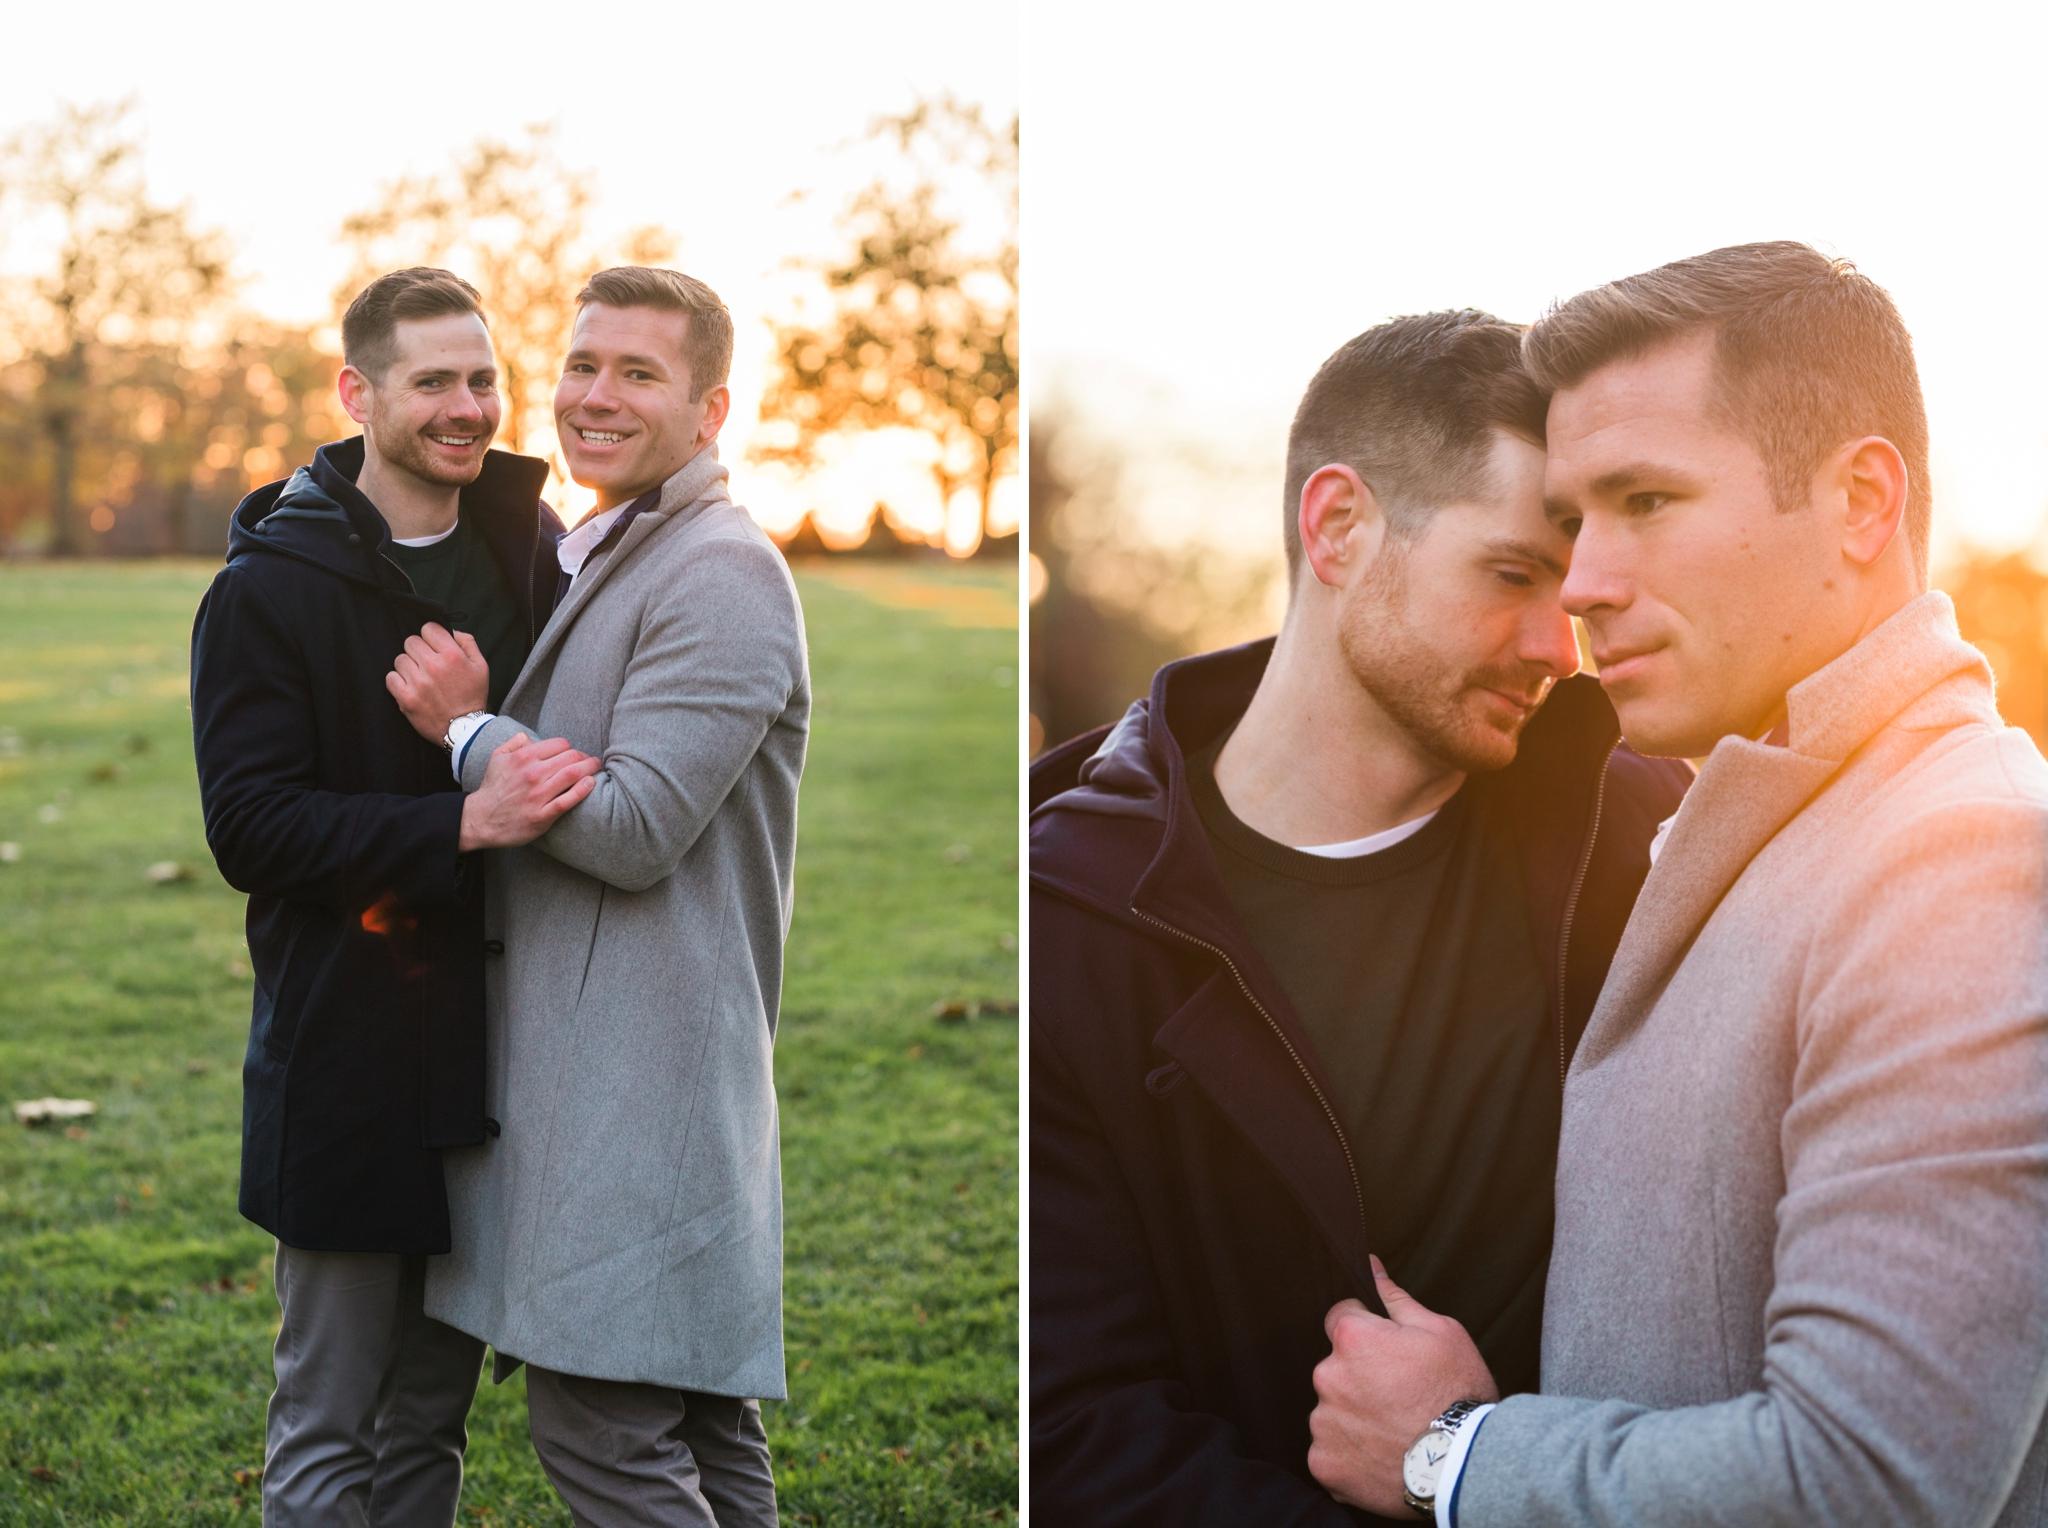 Emily Grace Photography, Lancaster PA Same Sex Wedding Photographer, Gay Engagement Session, Longwood Gardens Engagement Photos, Kennett Square PA